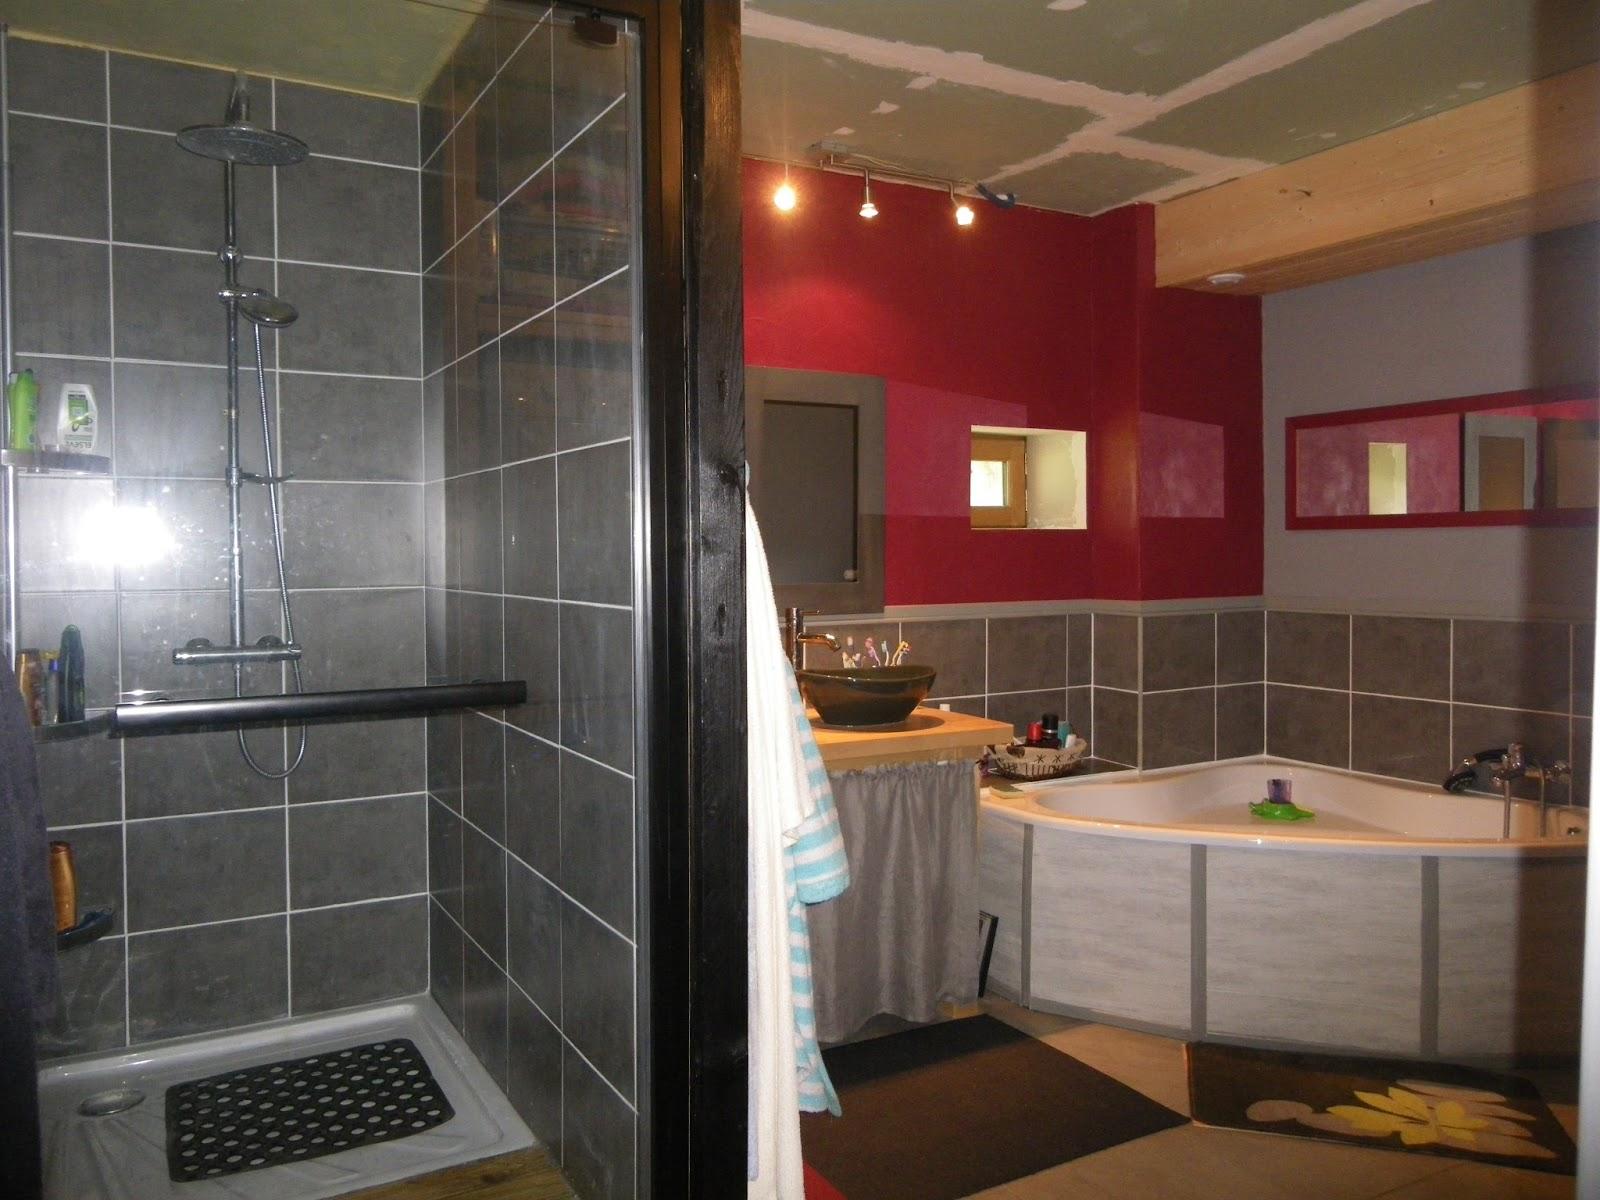 Mes3astucesd co salle de bain avant apr s - Salle de bain avant apres ...